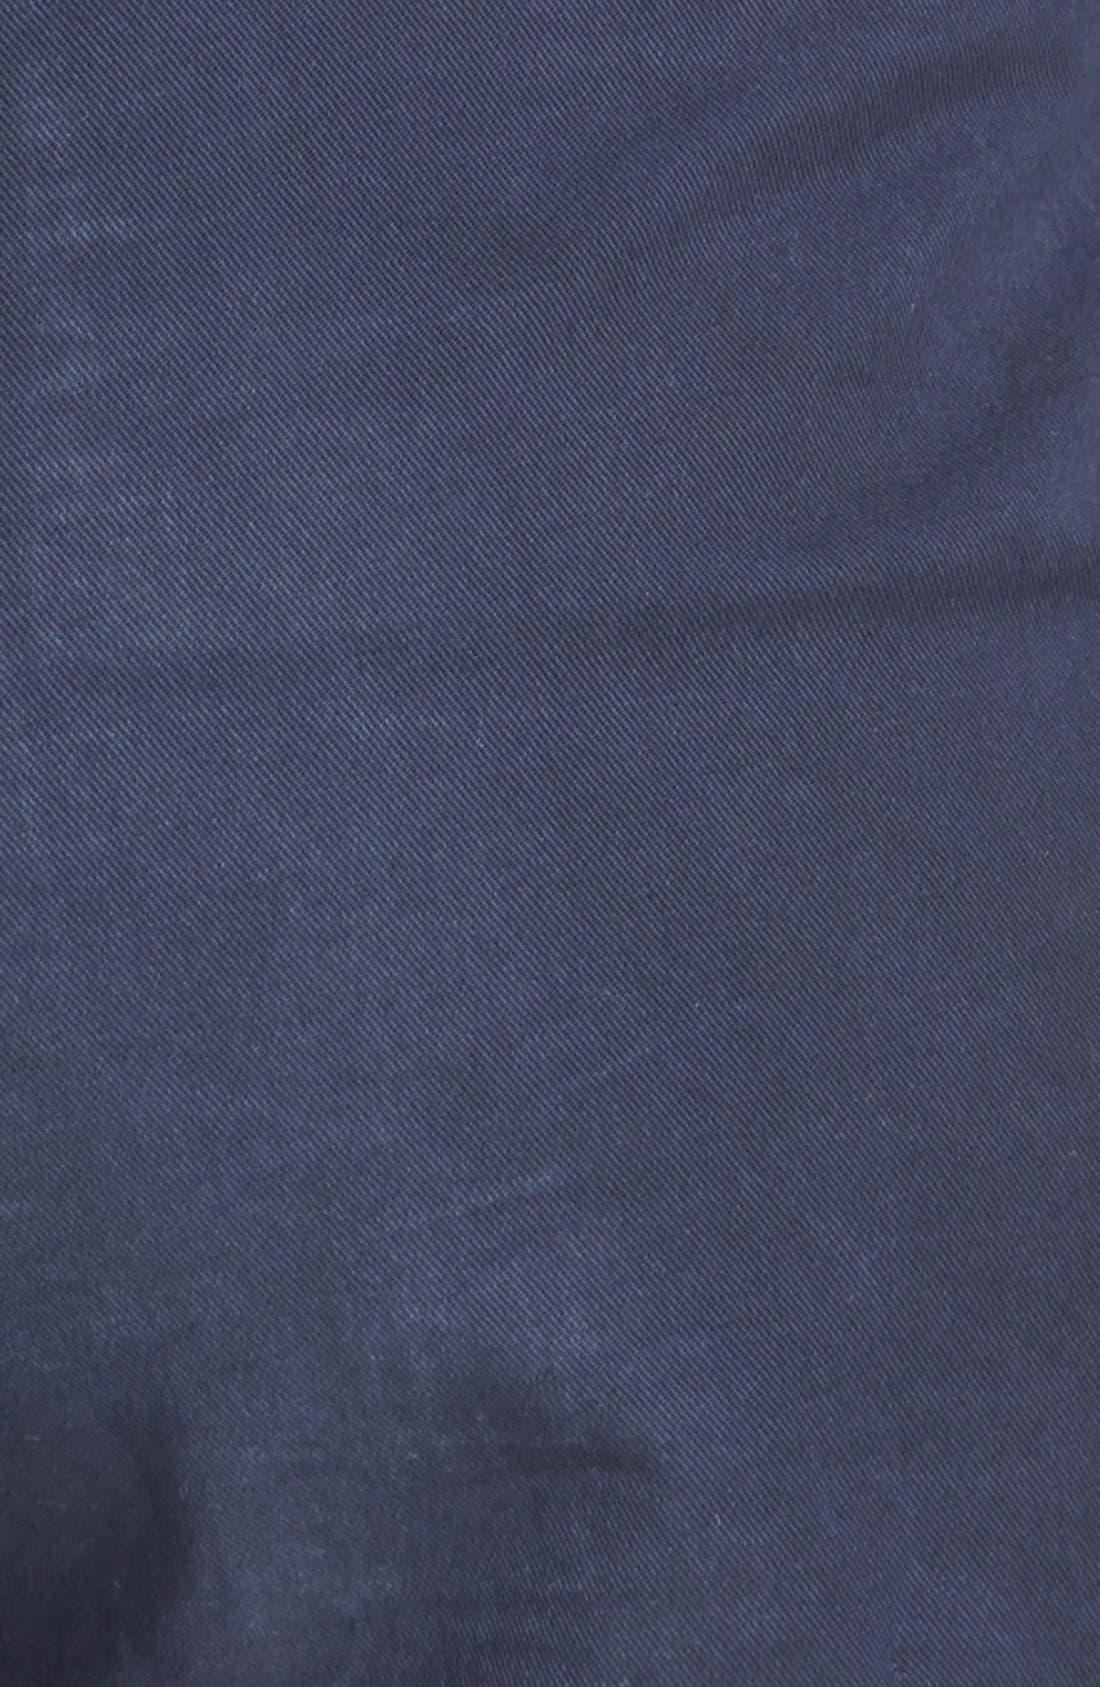 Alternate Image 3  - Caslon® Clean Front Five-Inch Shorts (Regular & Petite)